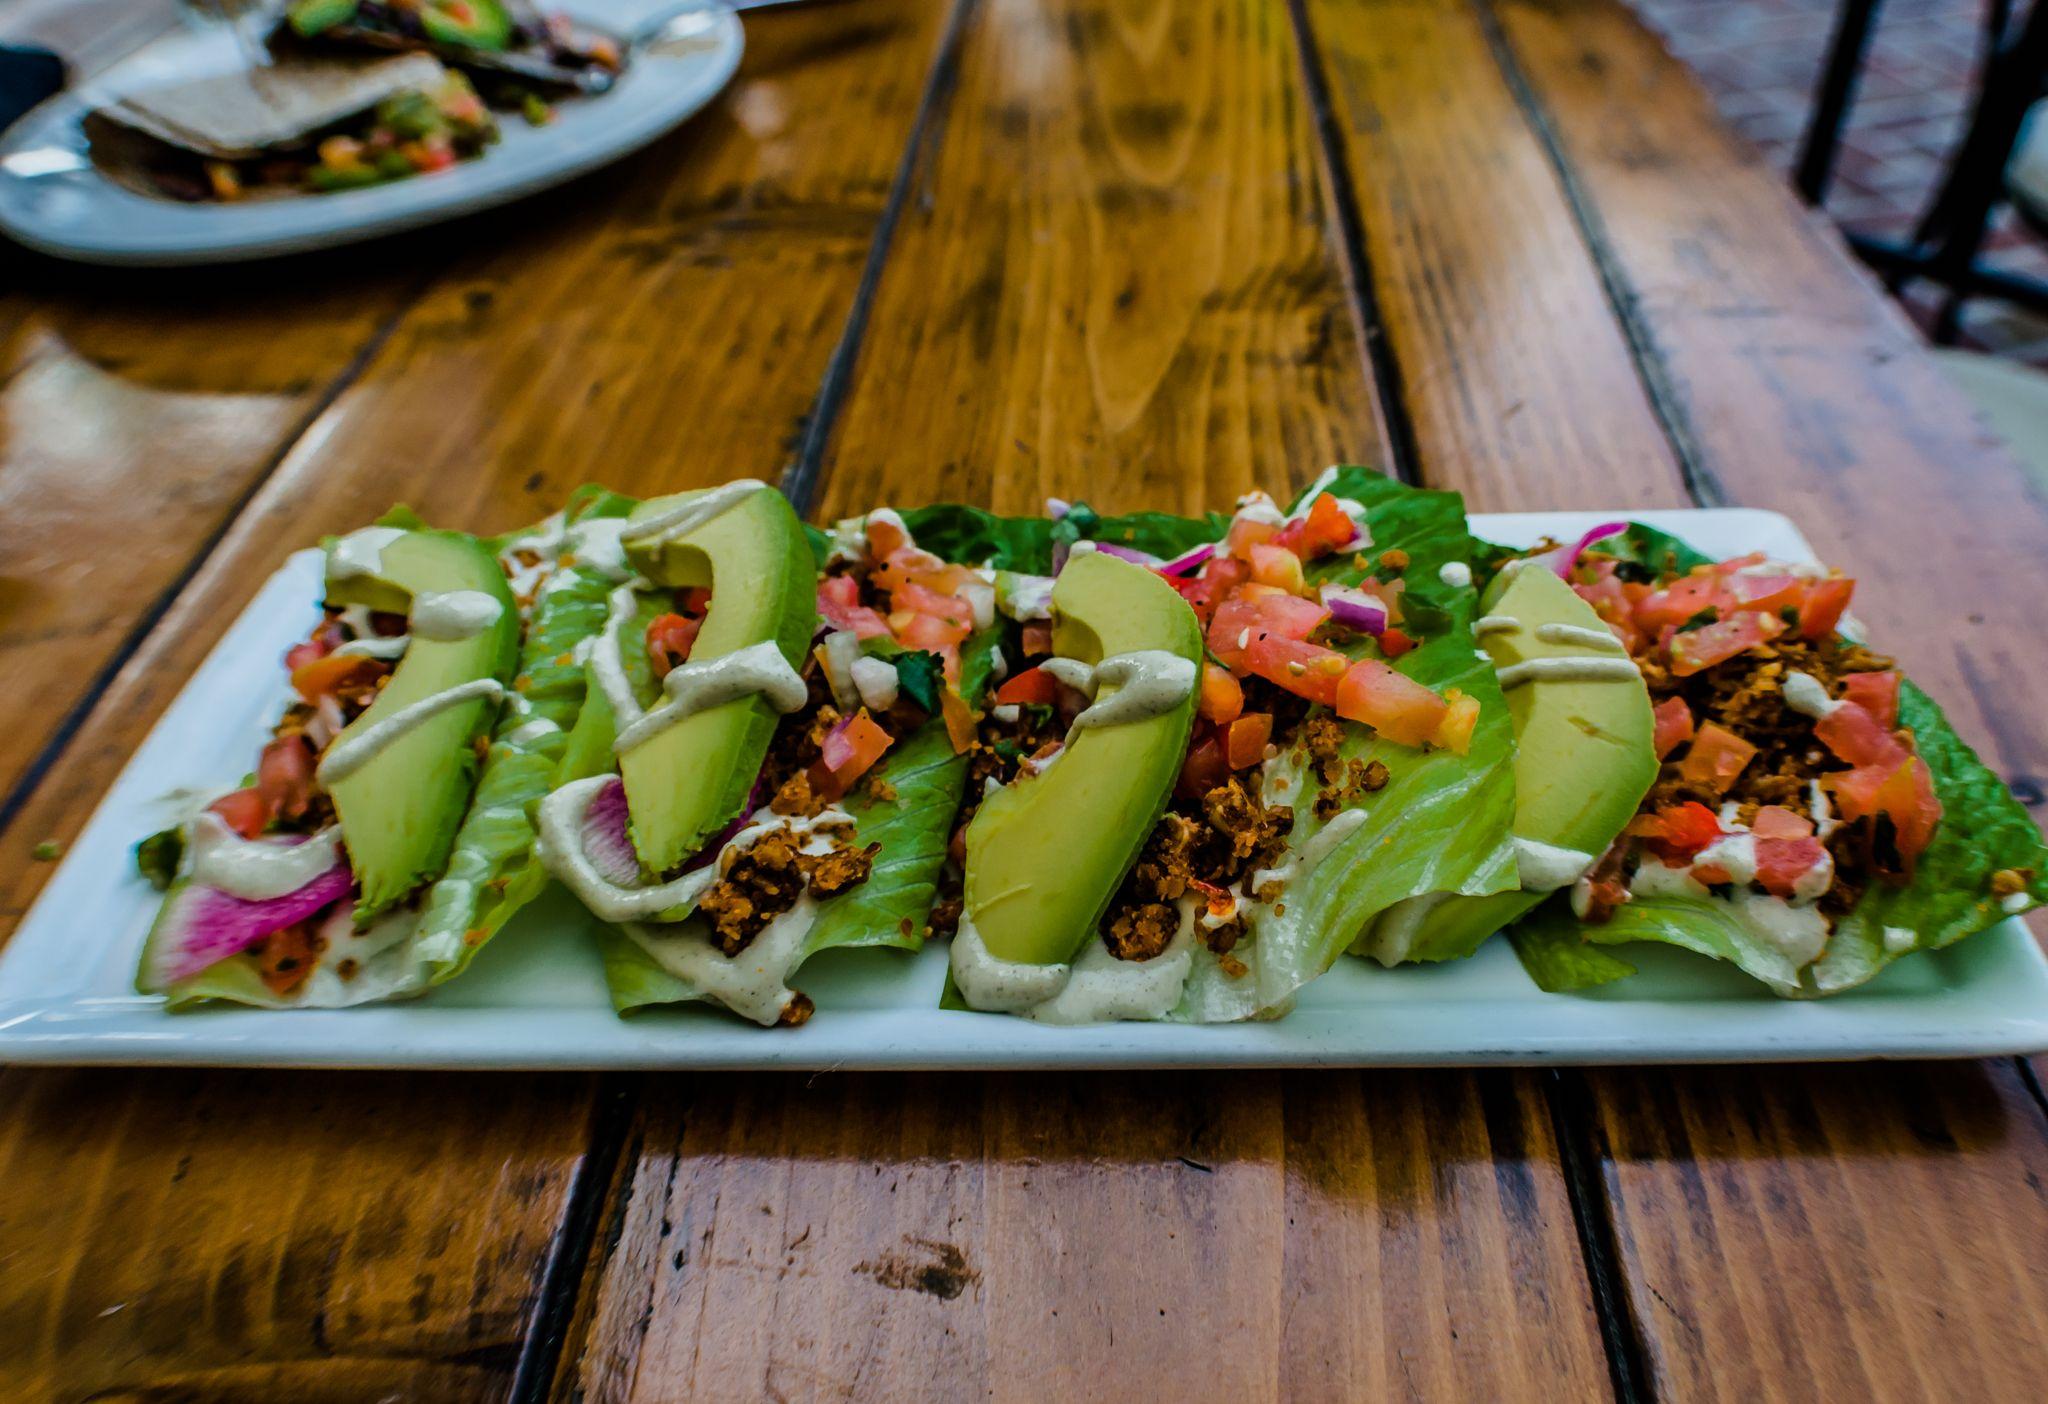 SunCafe ☀️ PlantBased Restaurant in Studio City, CA